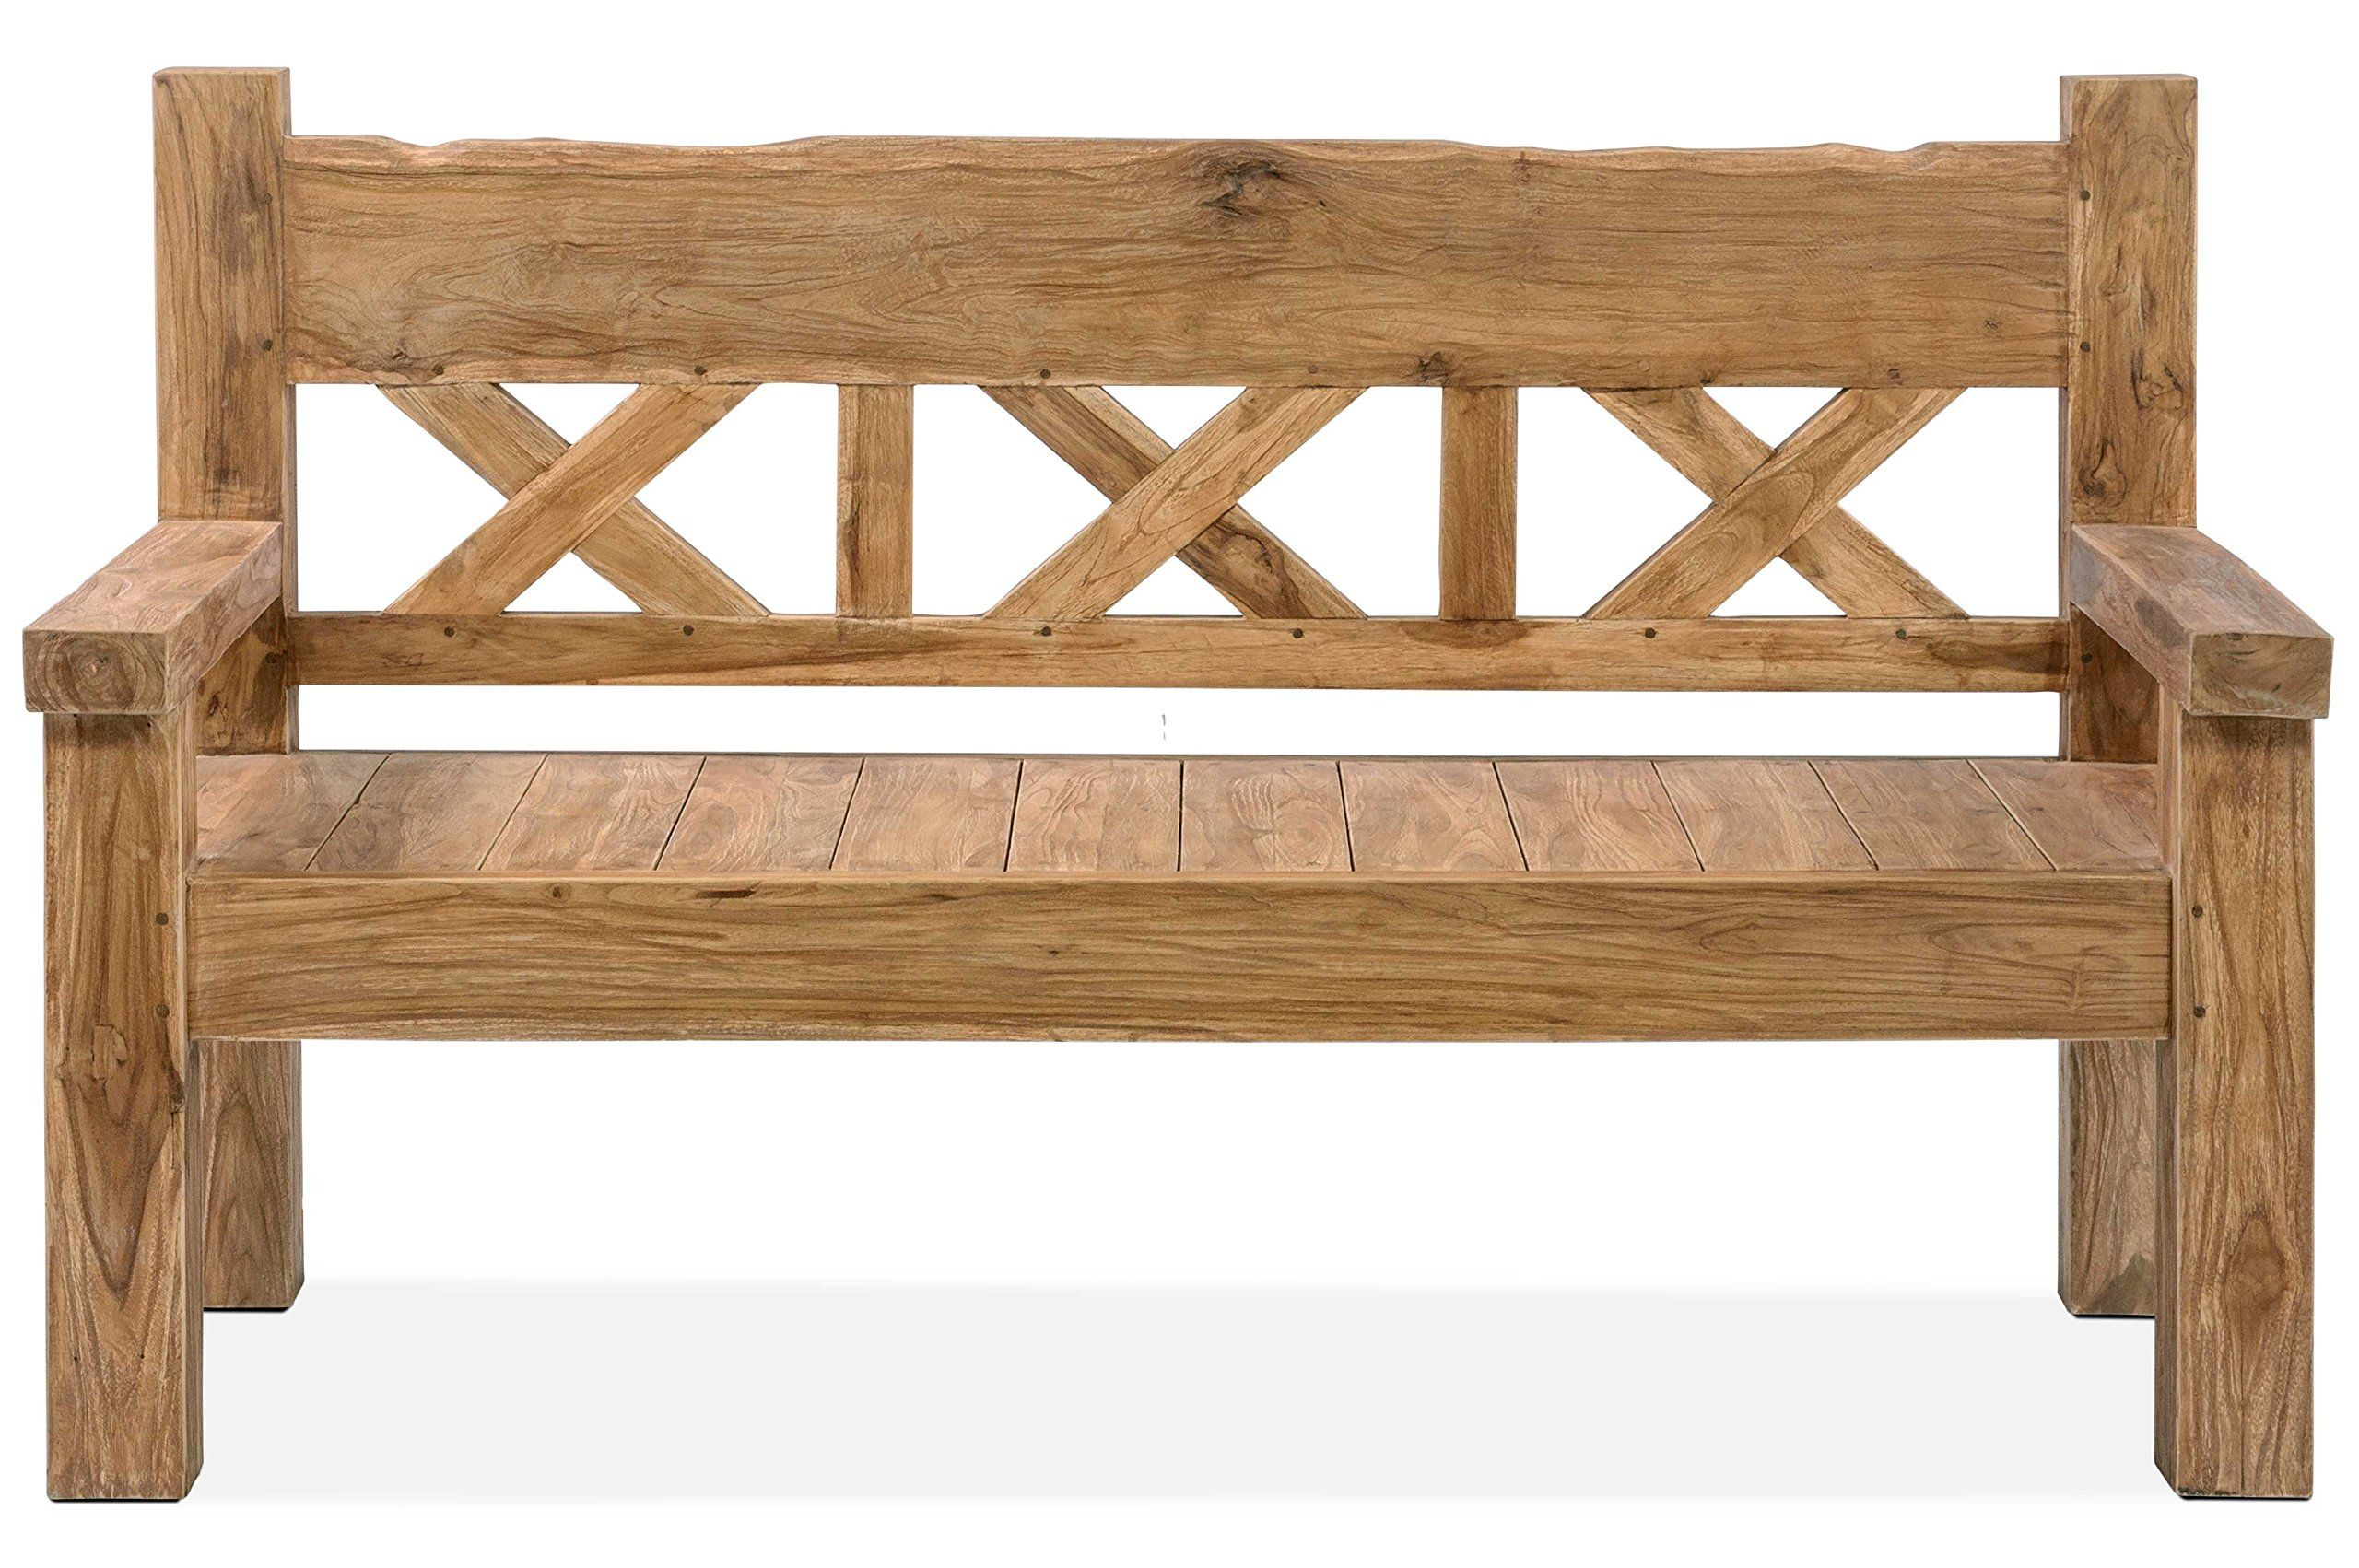 Amazon De Outflexx Gartenbank Grosse Sitz Bank In Natur Rustikal Geburstet Gartenbank Aus Teak Holz Ho Gartenbank Holz Rustikal Gartenmobel Design Teak Holz